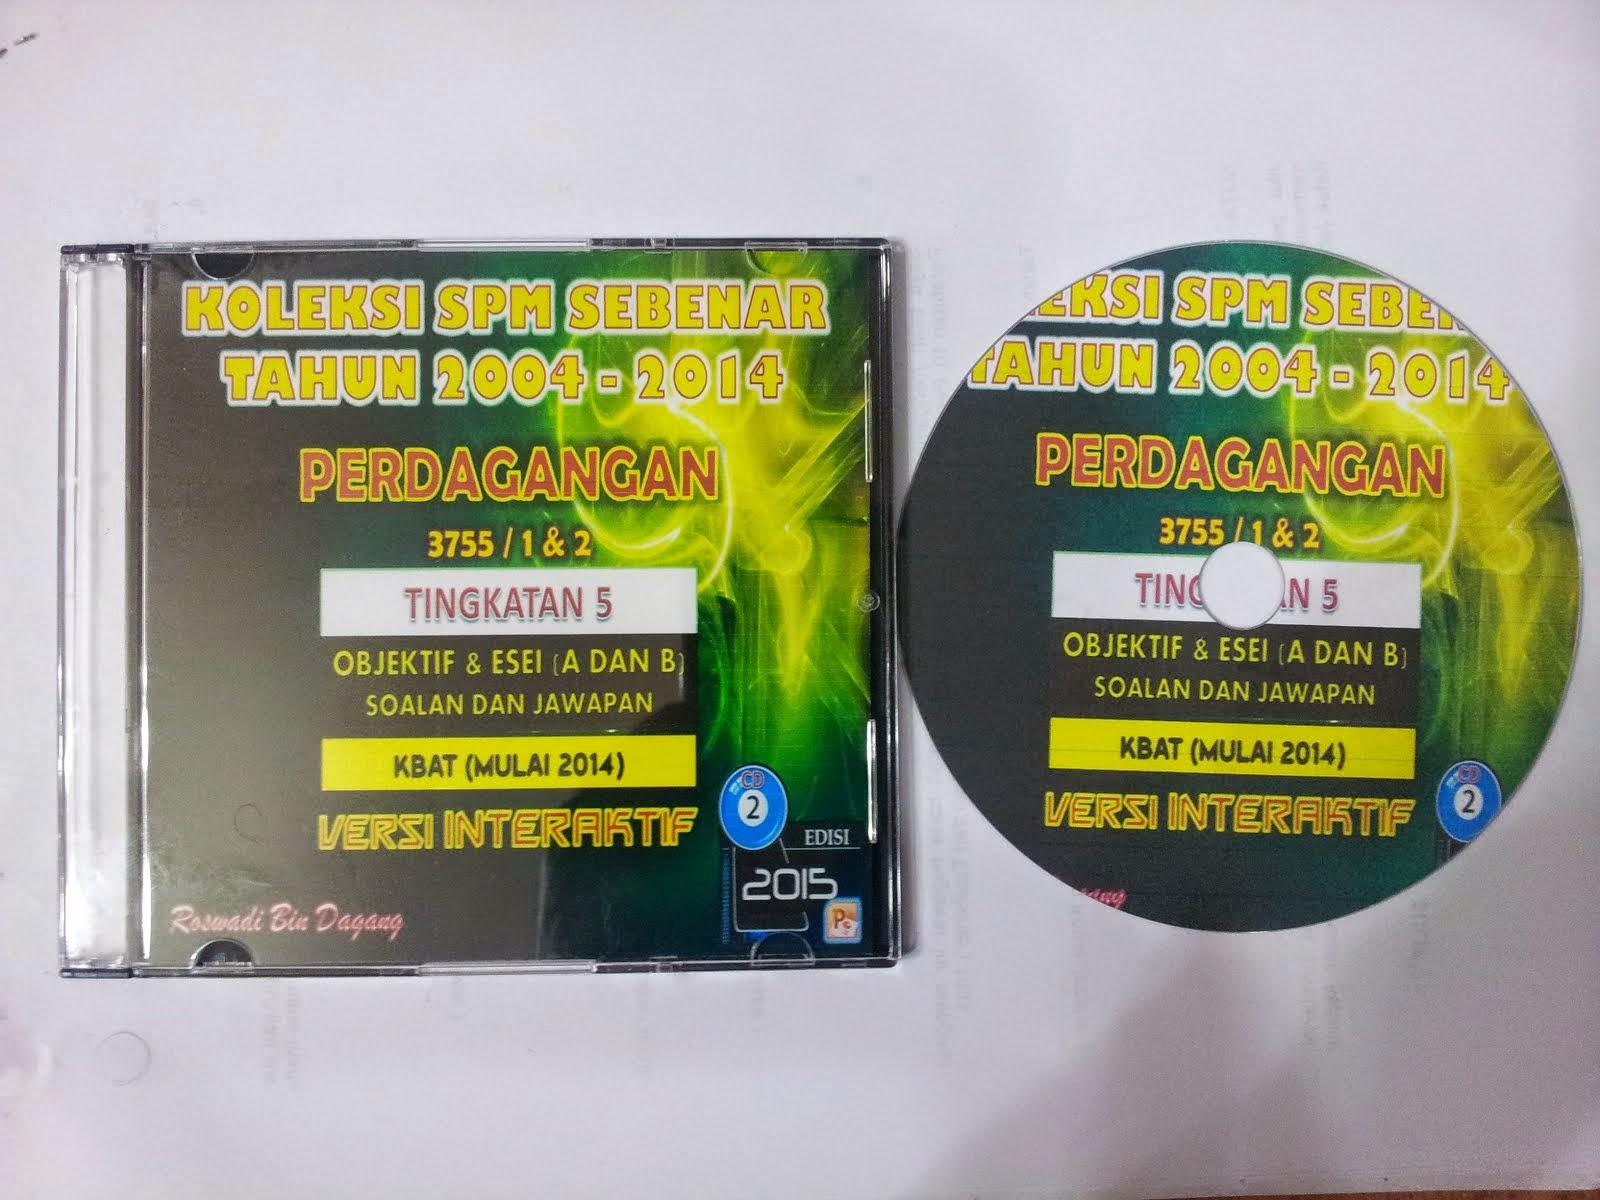 3 CD INTERAKTIF KOLEKSI SPM SEBENAR TAHUN 2004 -2014